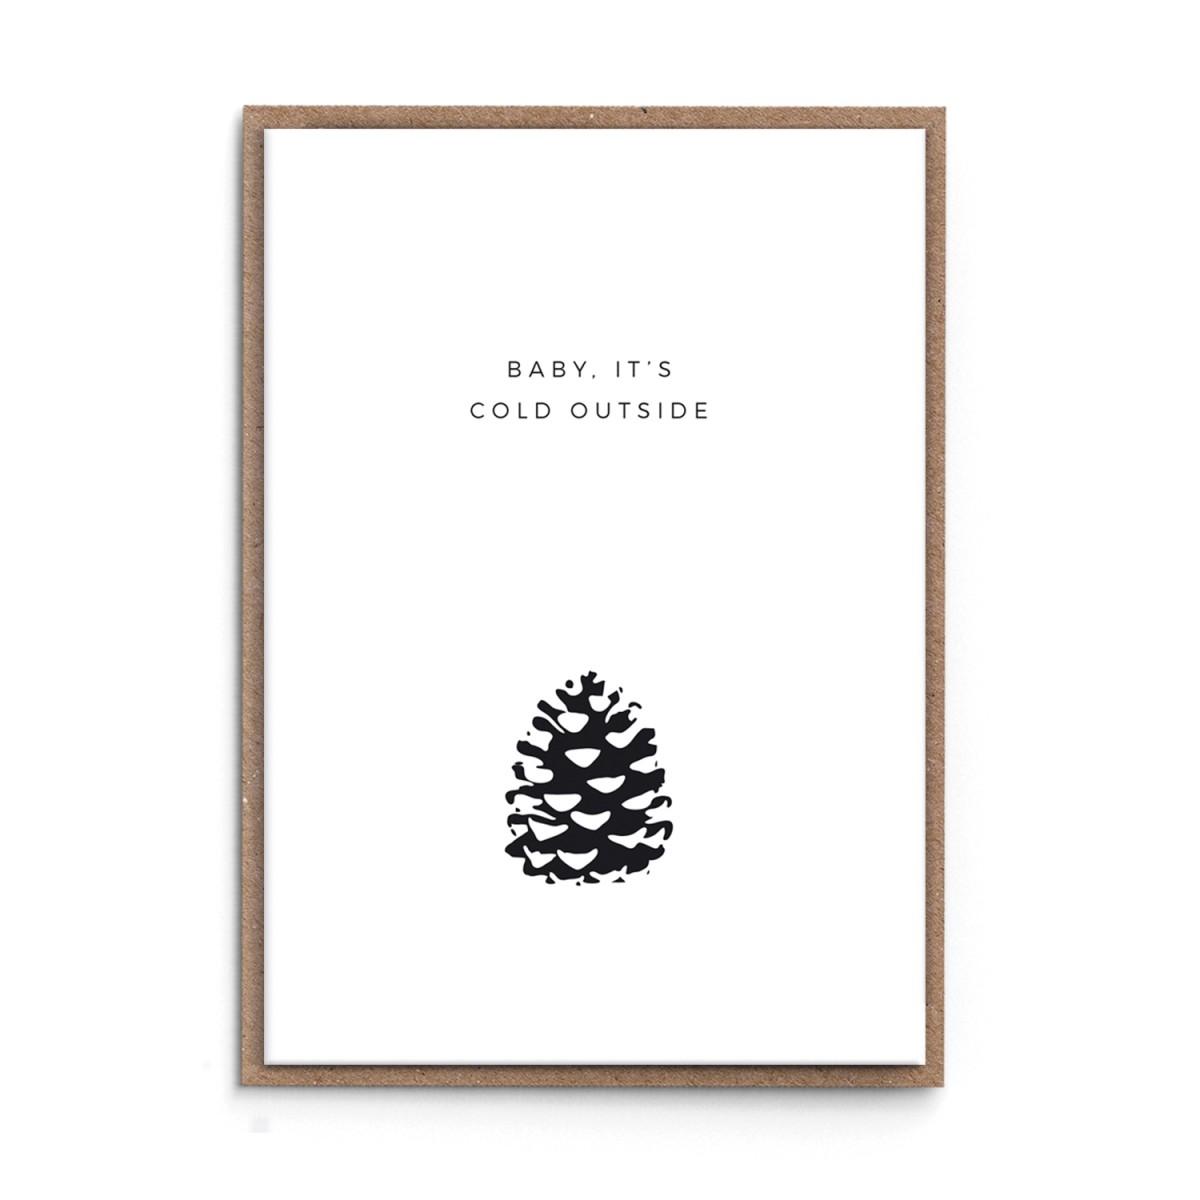 "sonst noch was? Weihnachtskarte ""Baby, it's cold outside"""